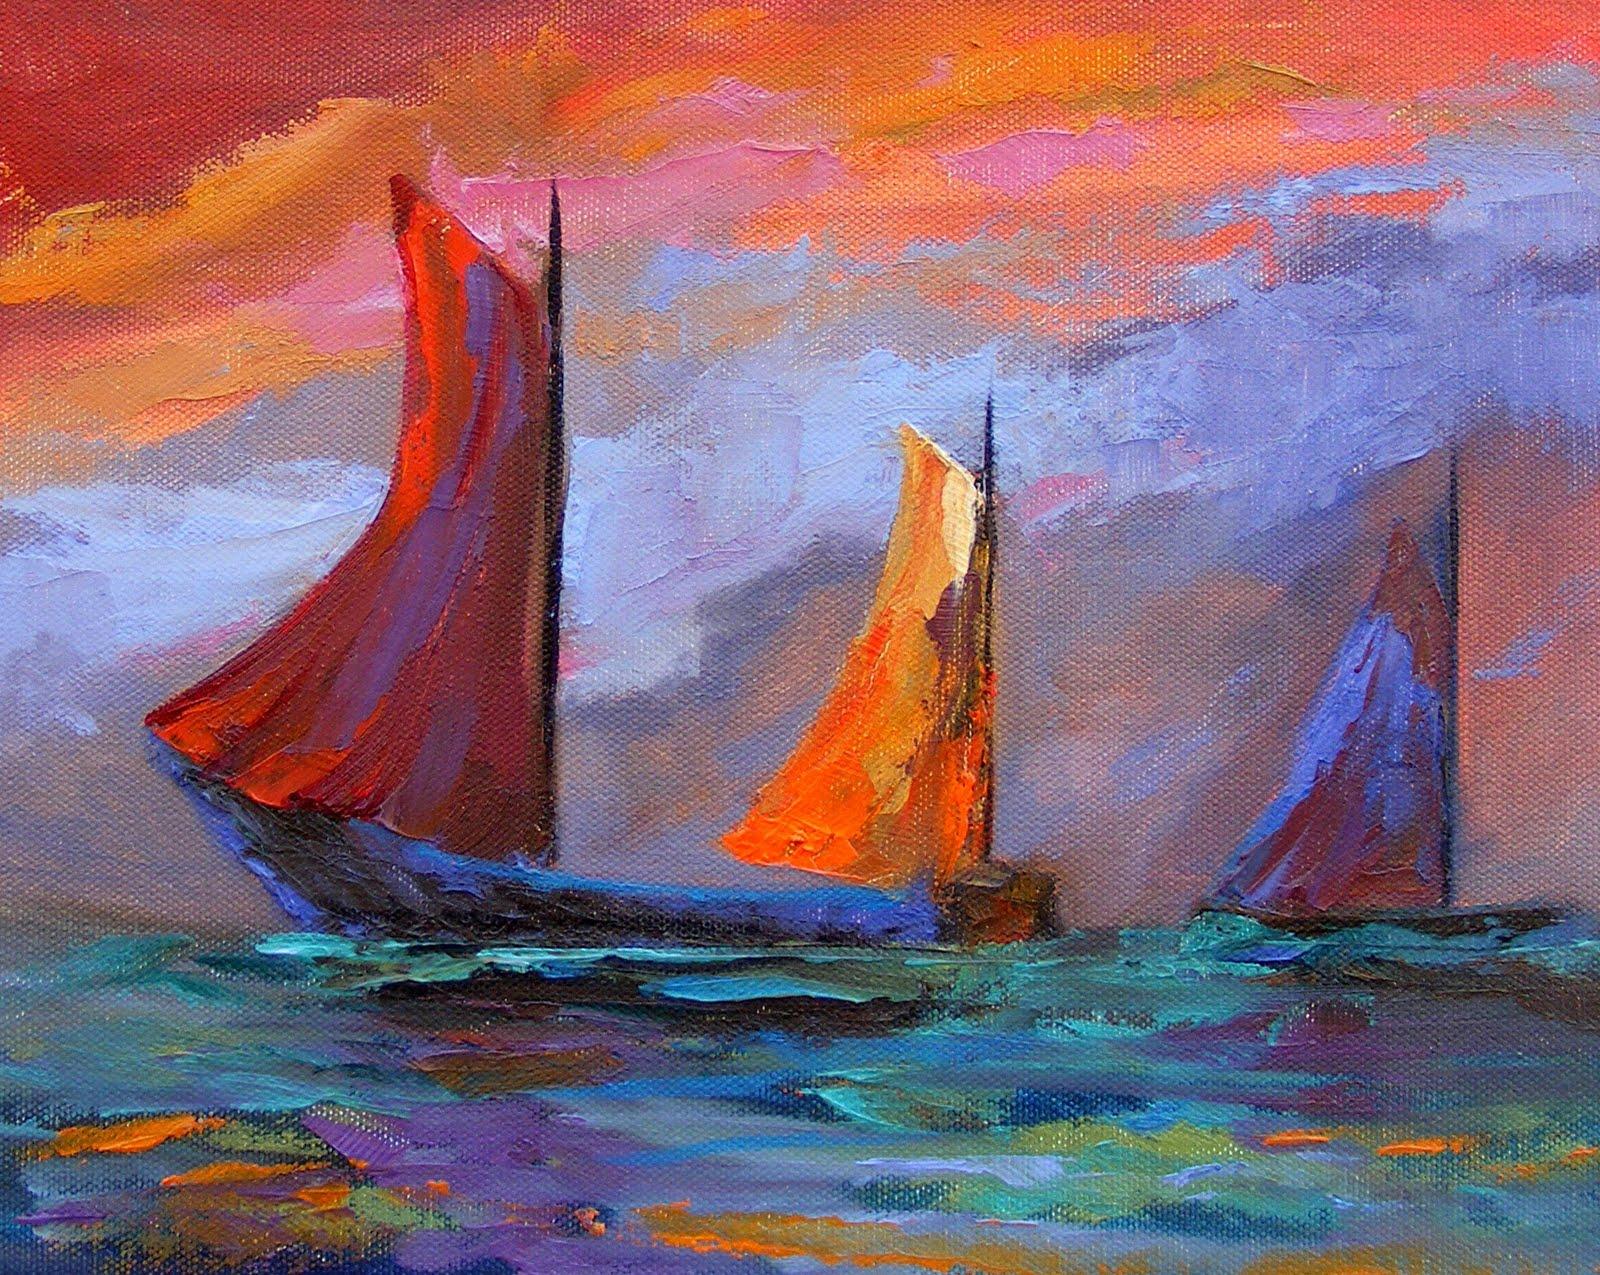 """Abstract Boats, Abstract"" original fine art by Diana Delander"